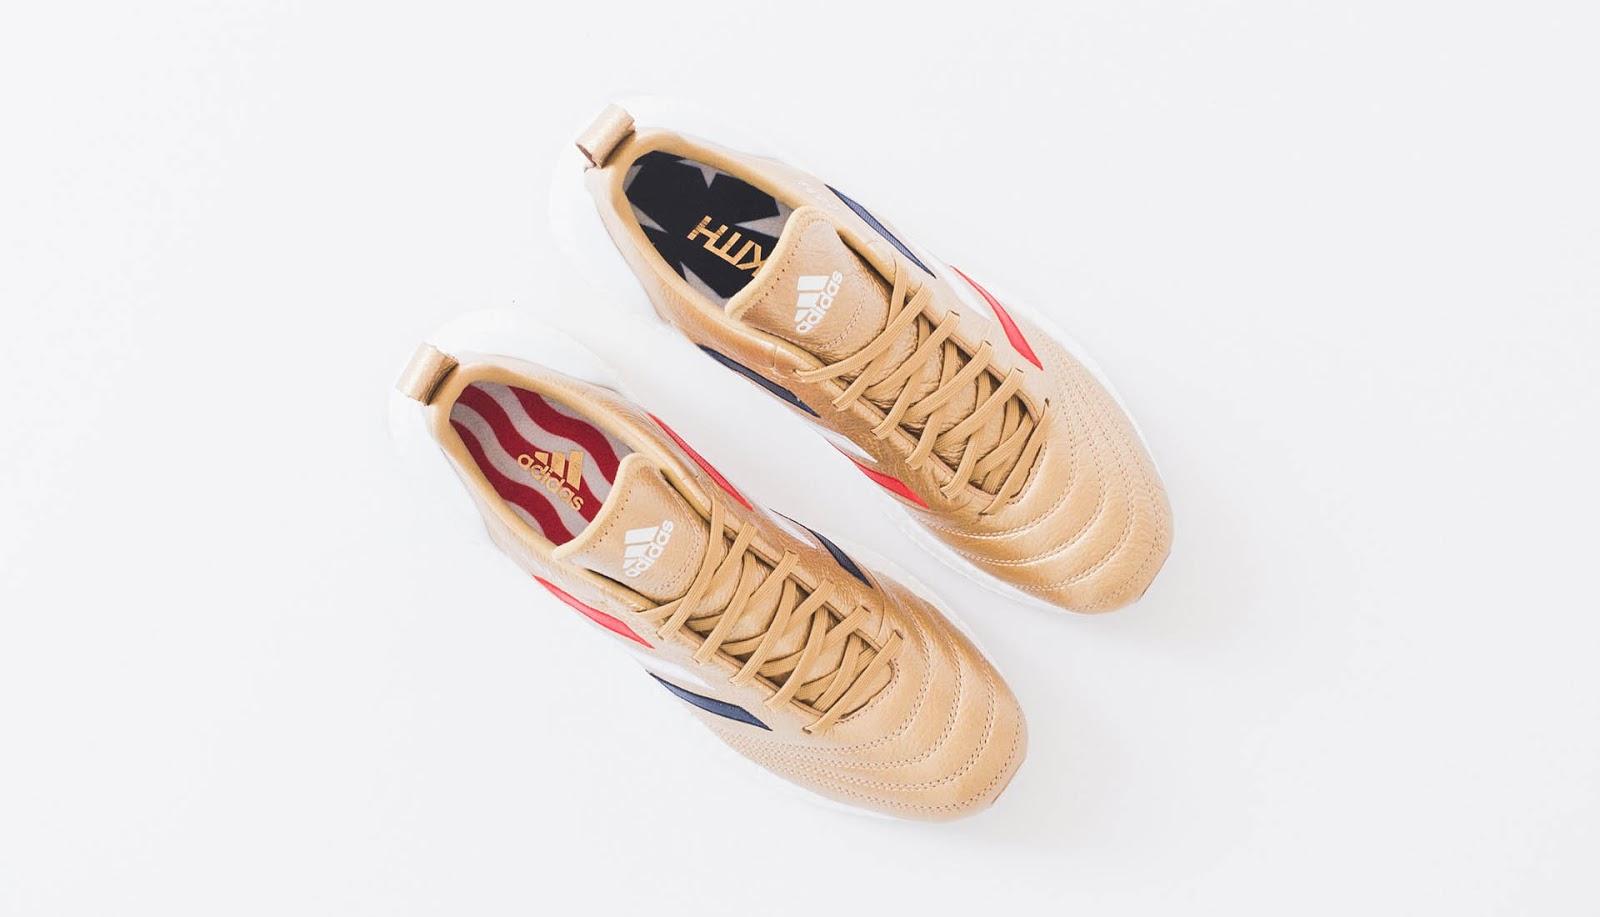 917b13f1e The Kith x Adidas Soccer COPA Mundial 18 UltraBOOST retails at  200 USD.  The Kith x Adidas Soccer Chapter 3 footwear ...